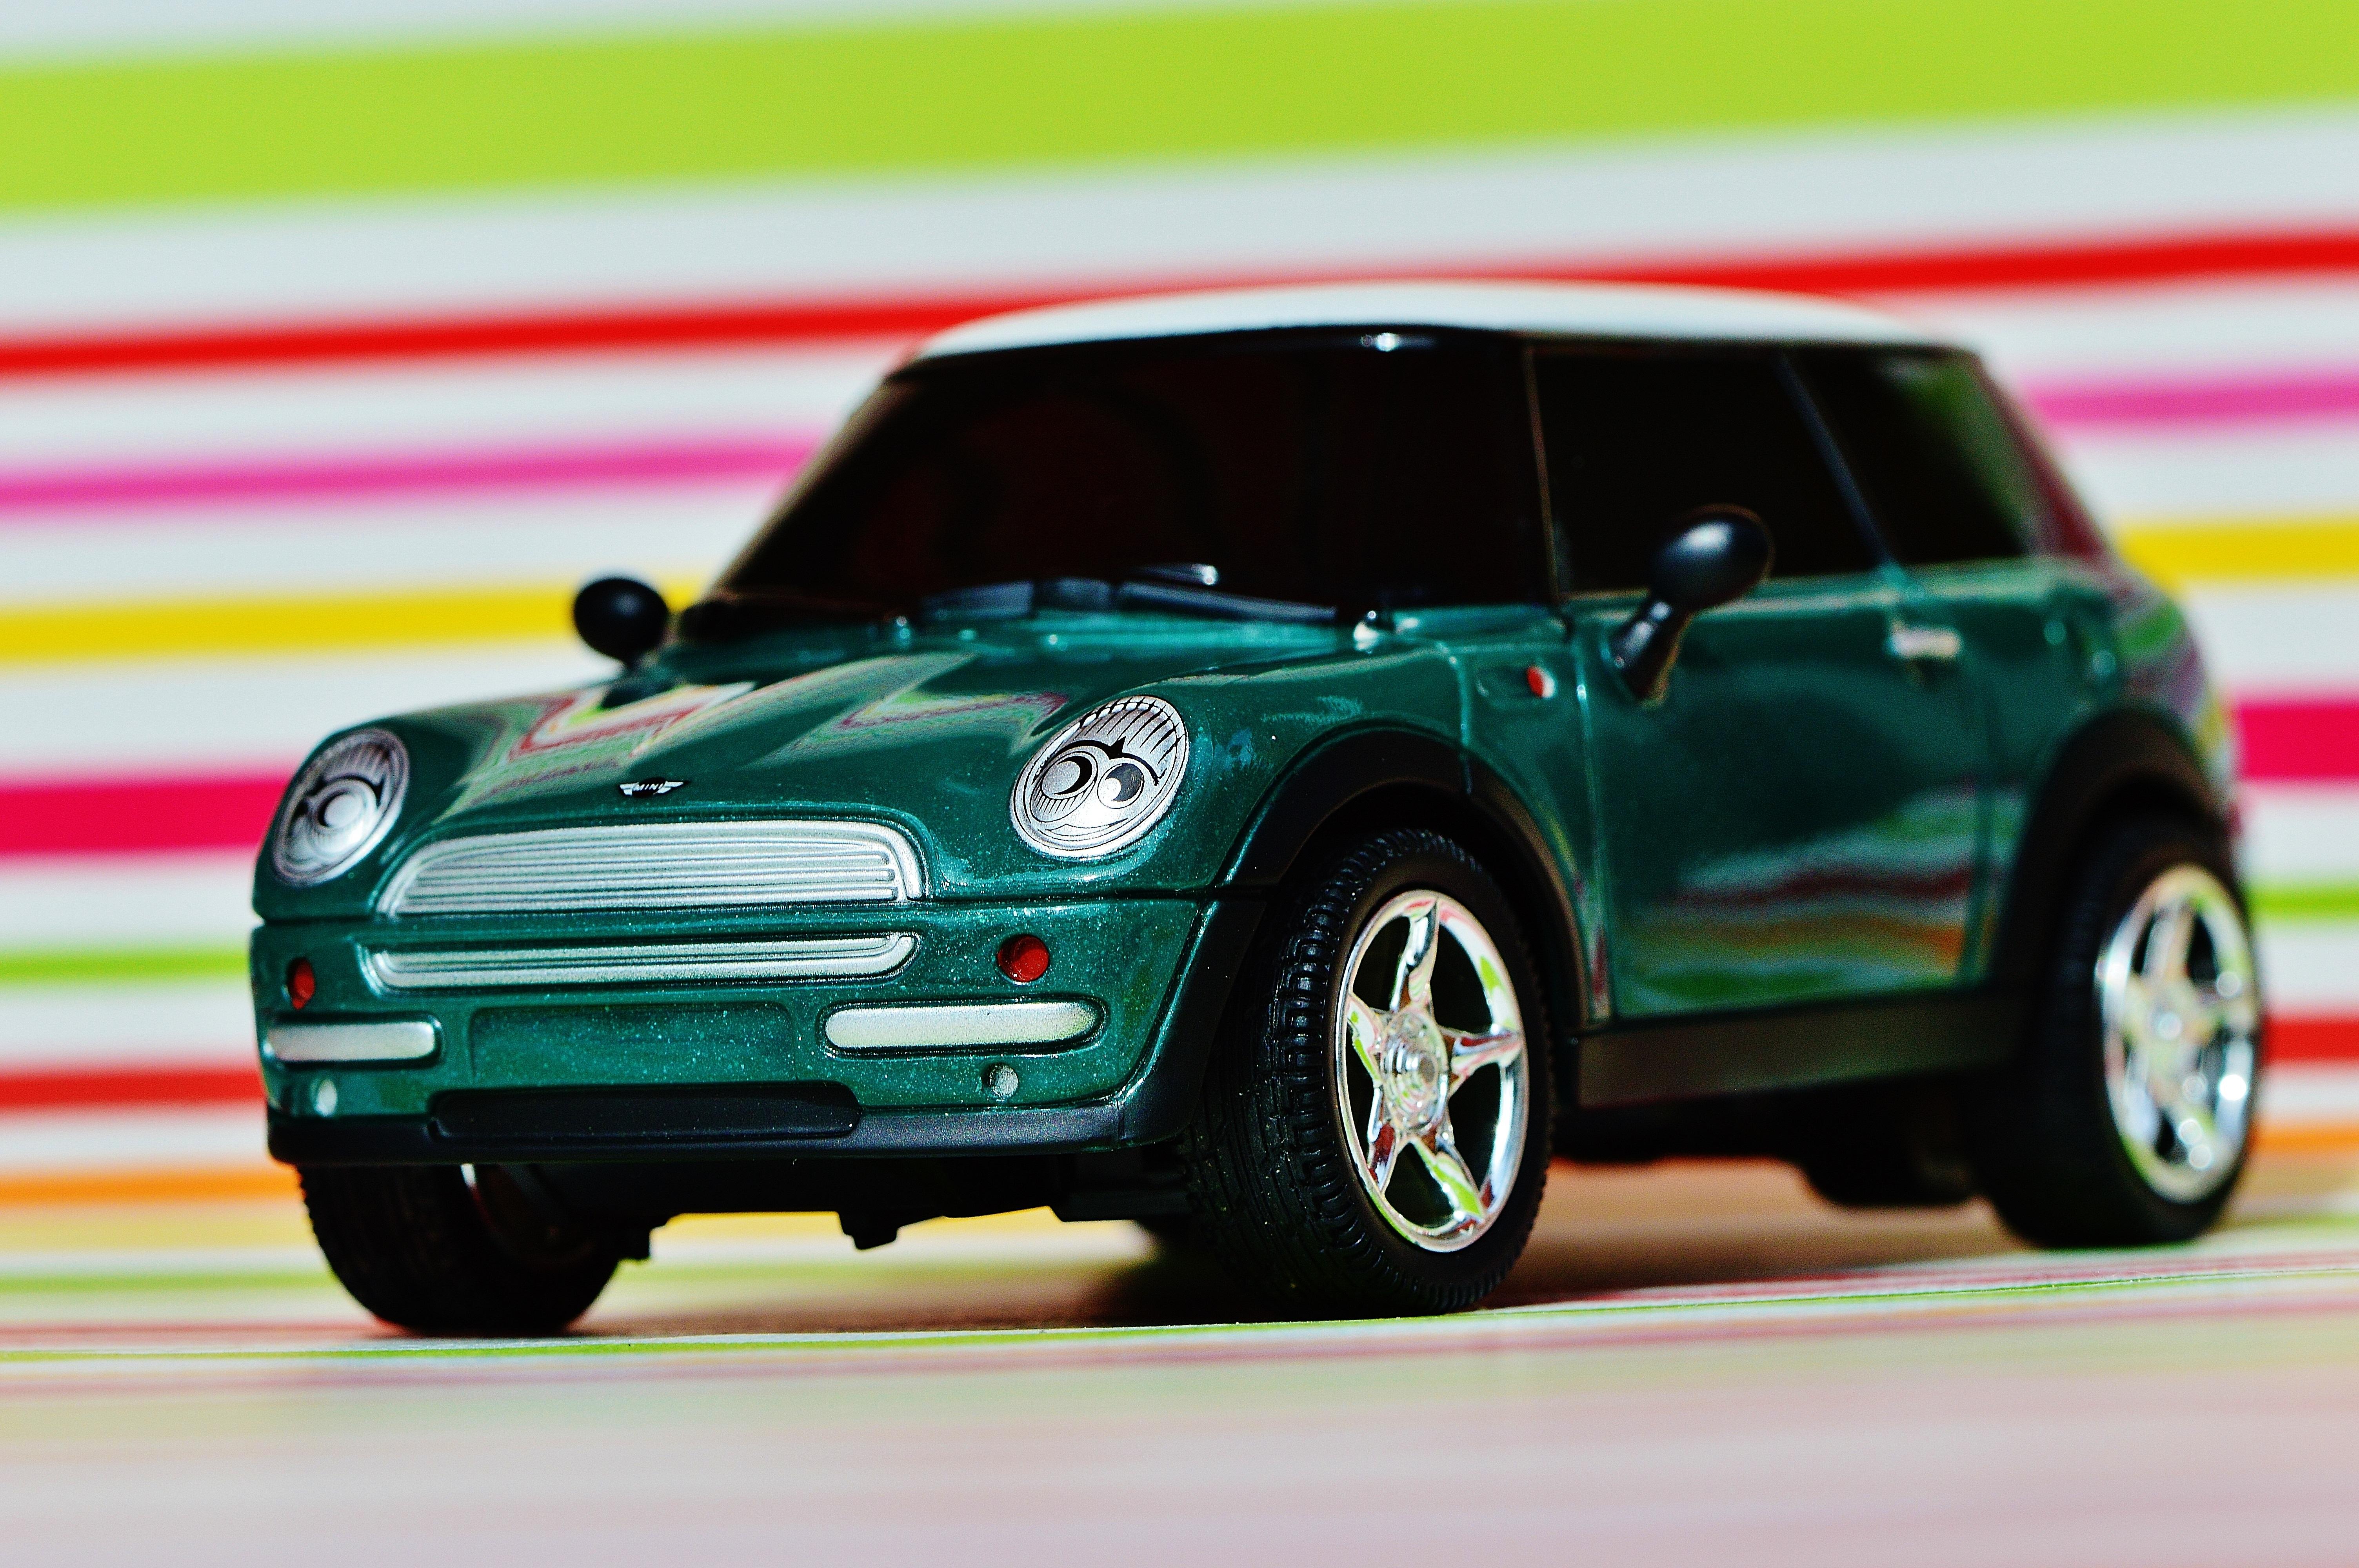 Car Wheel Model Green Vehicle Auto Motor Mini Cooper City Land